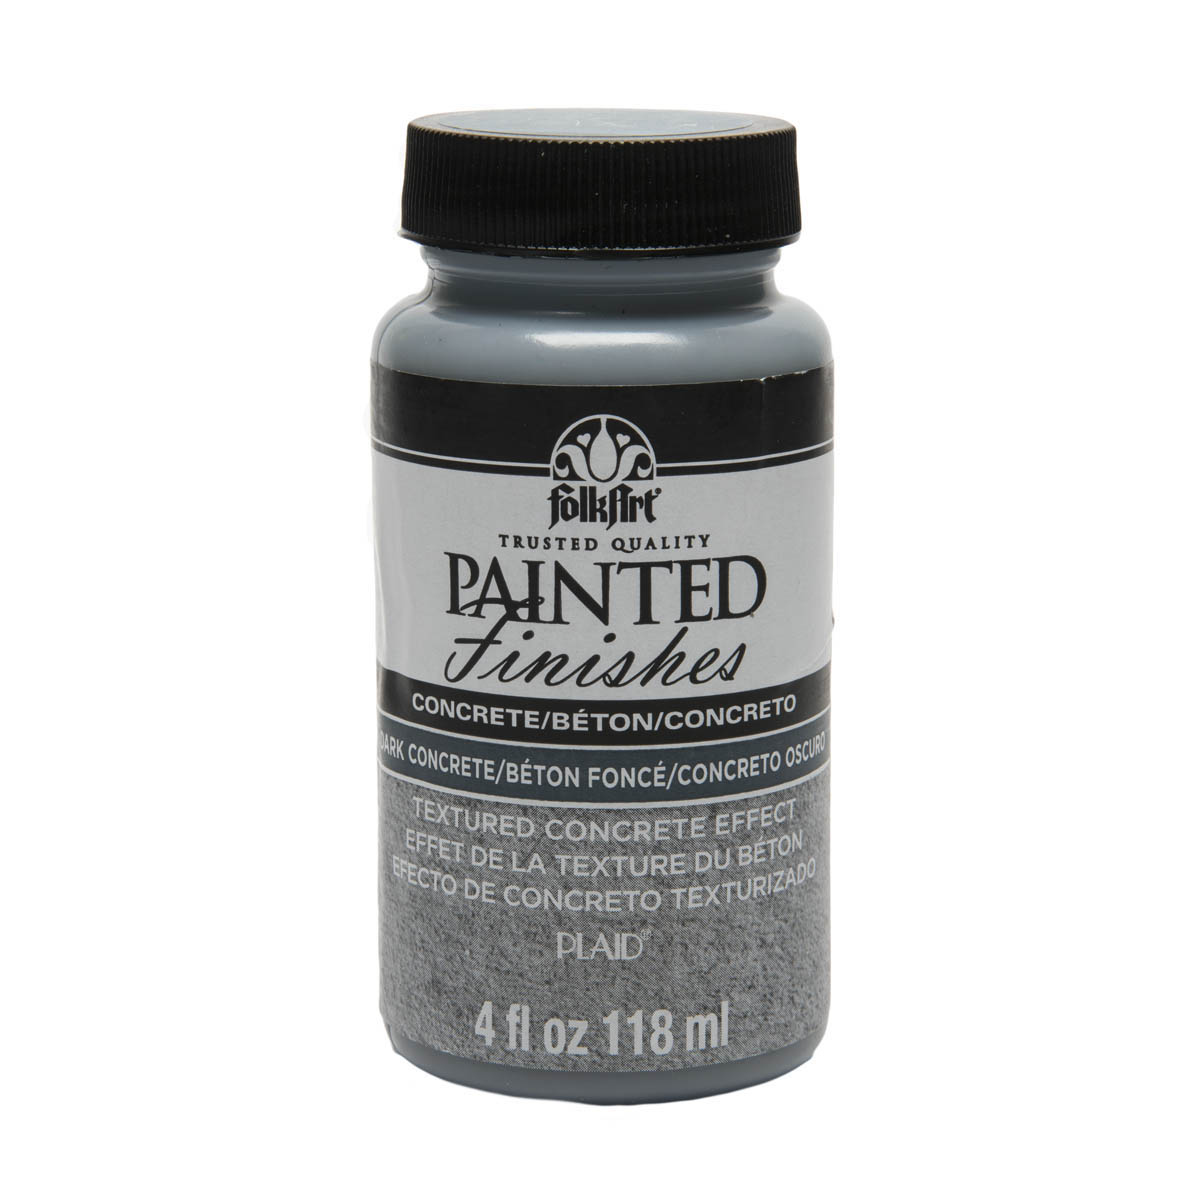 FolkArt ® Painted Finishes - Dark Concrete, 4 oz.